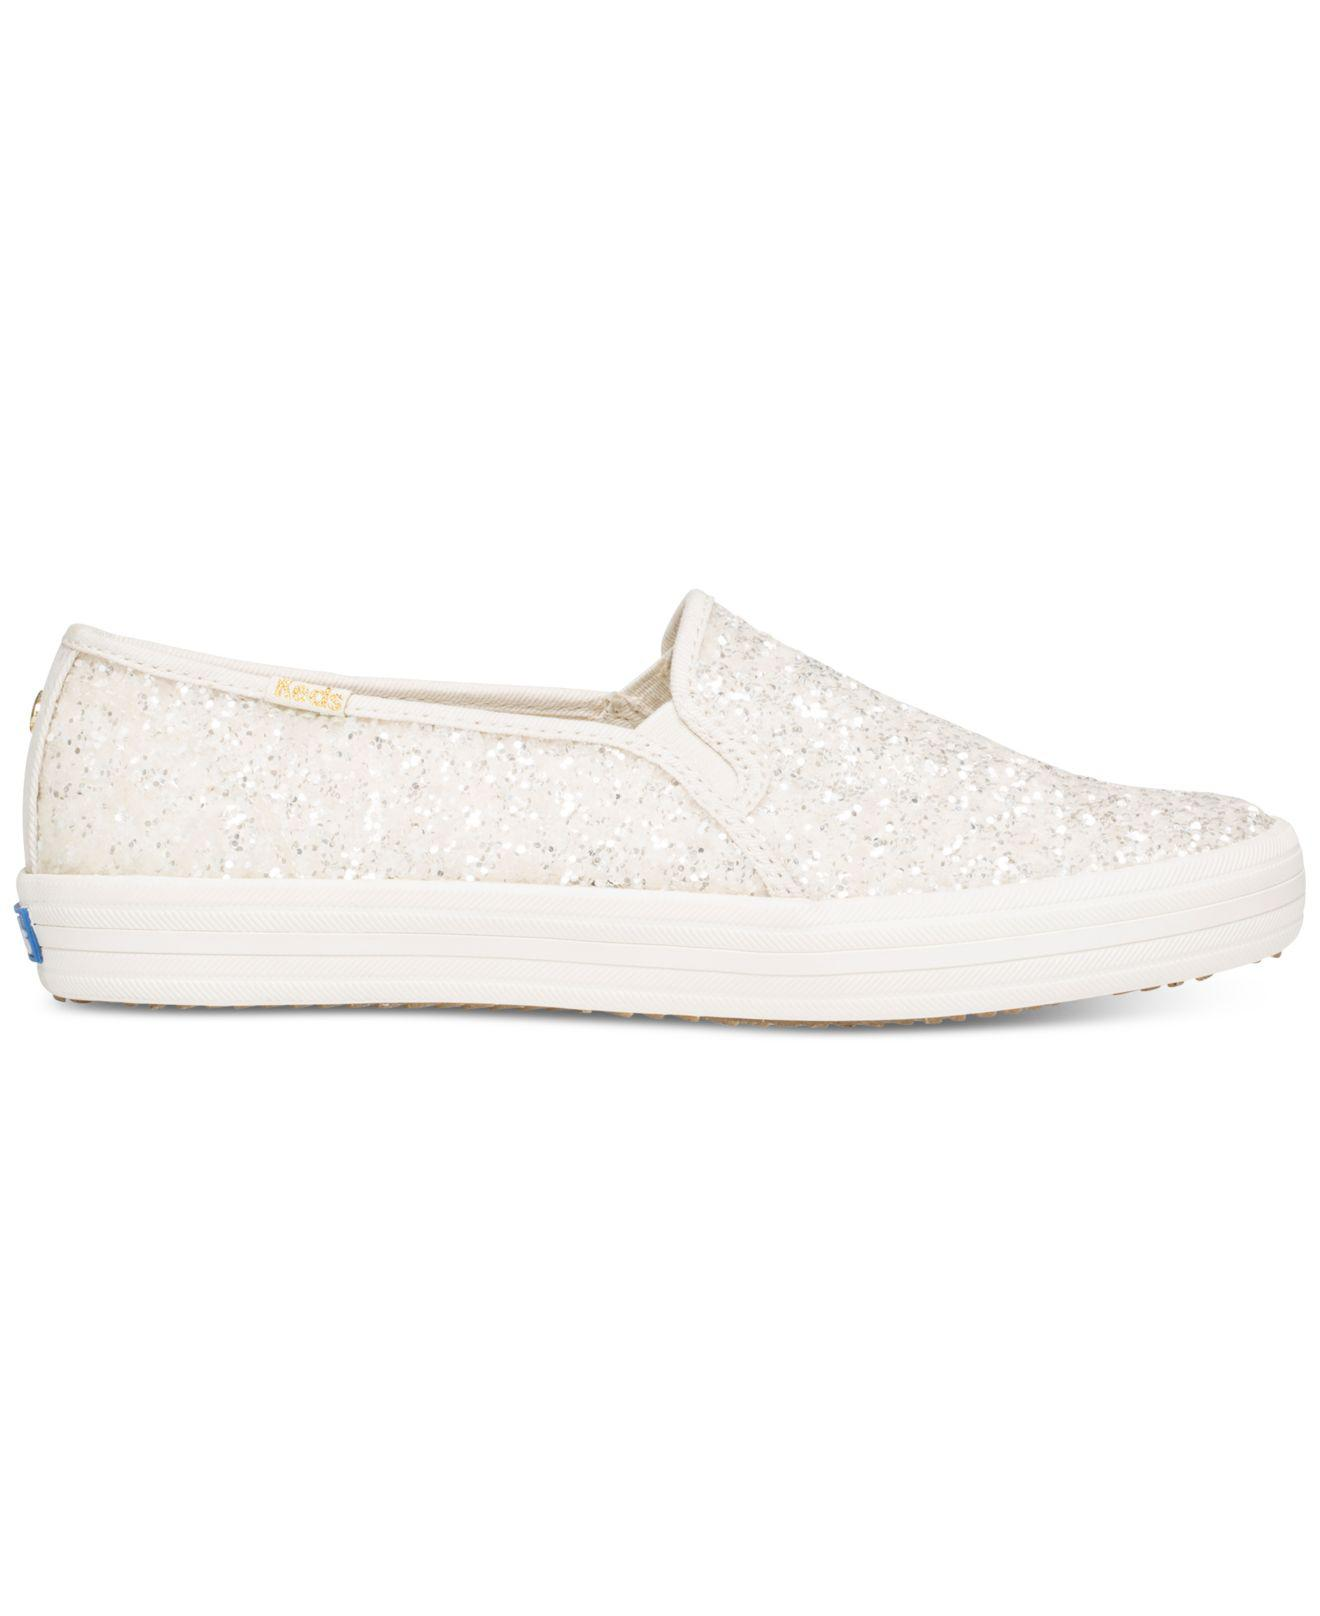 d92fdefb3234 Lyst - Kate Spade Keds For Double Decker Glitter Sneakers